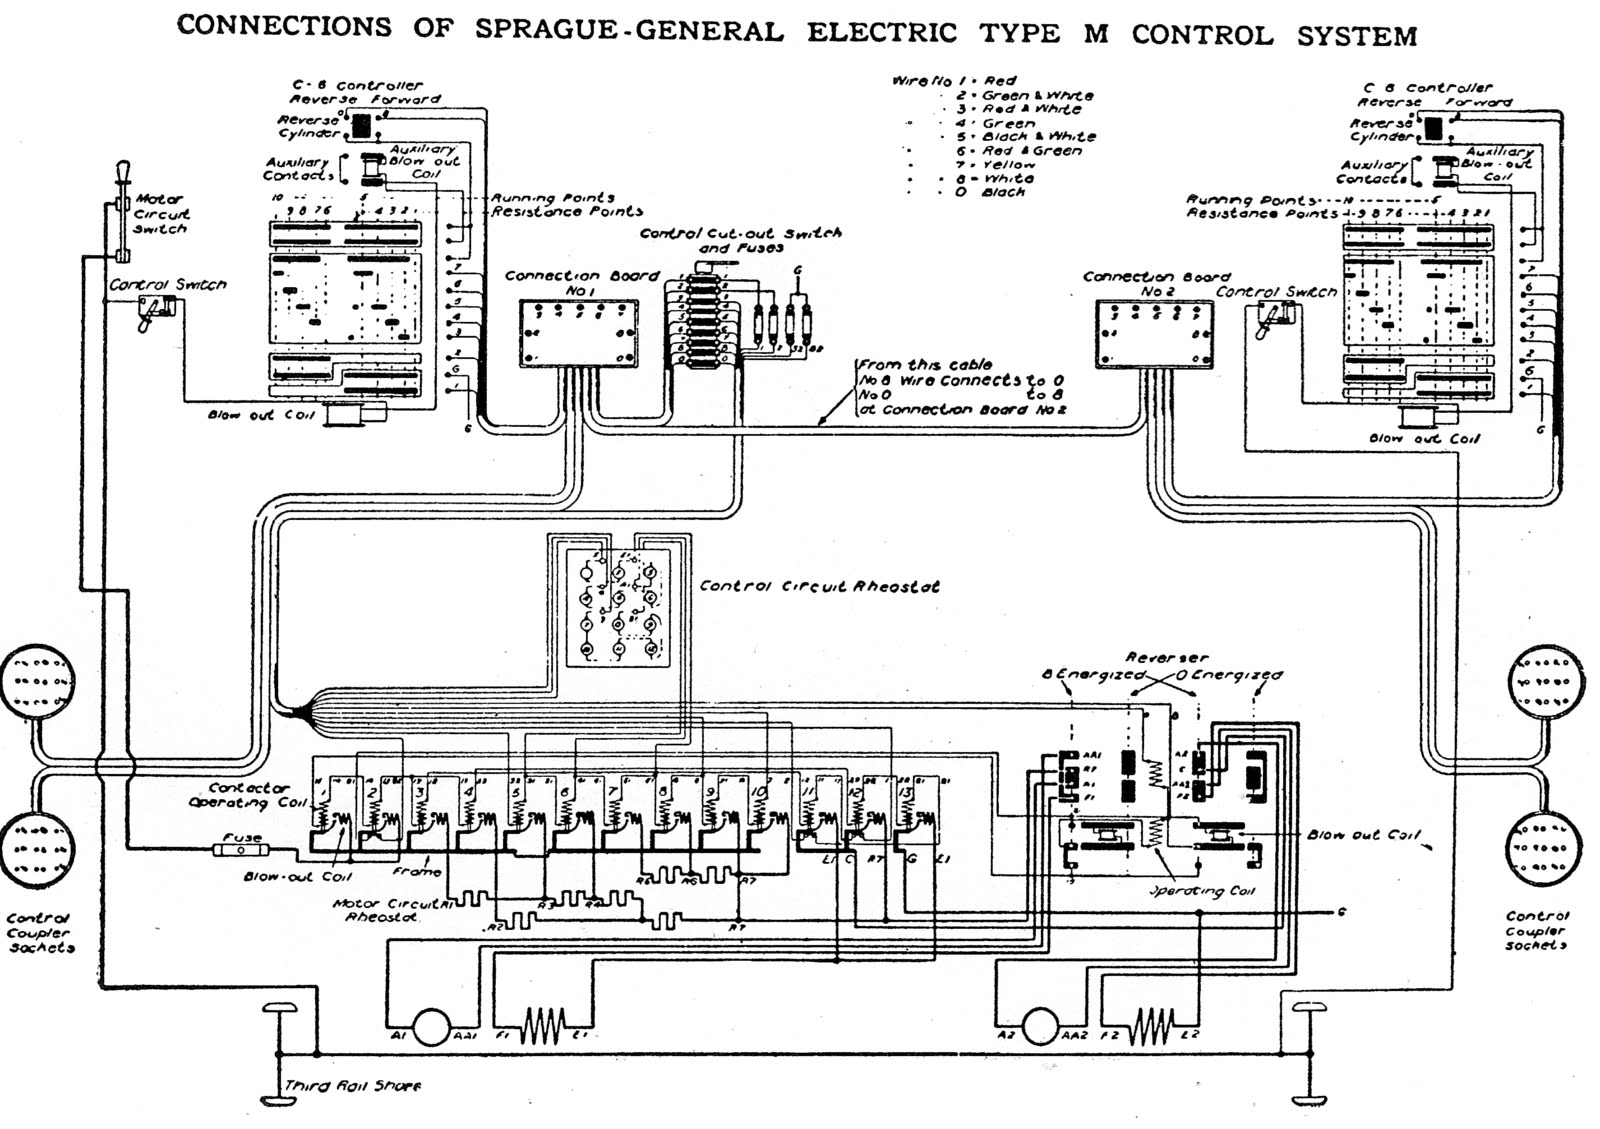 1979 Honda Cm400a Wiring Diagram Diagrams Xr80 Imageresizertool Com Cm400t